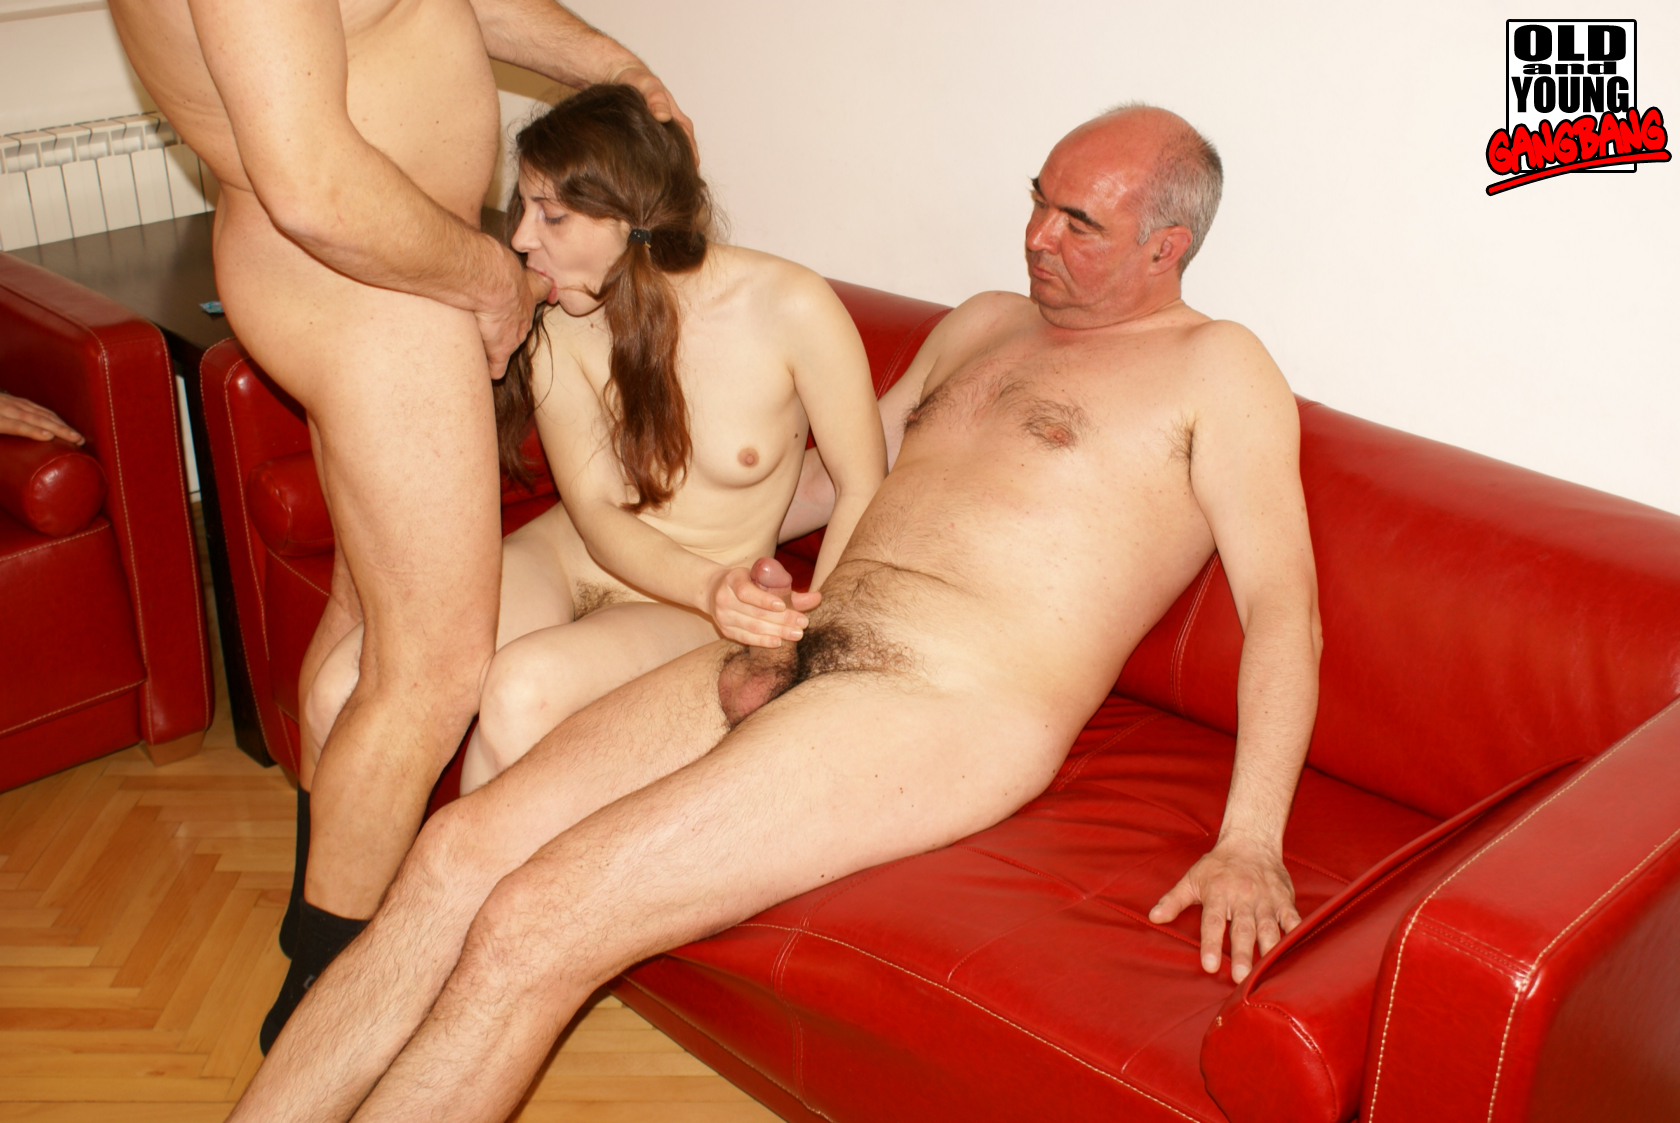 Old Man Best Porn suck old men sex best porno   free hot nude porn pic gallery